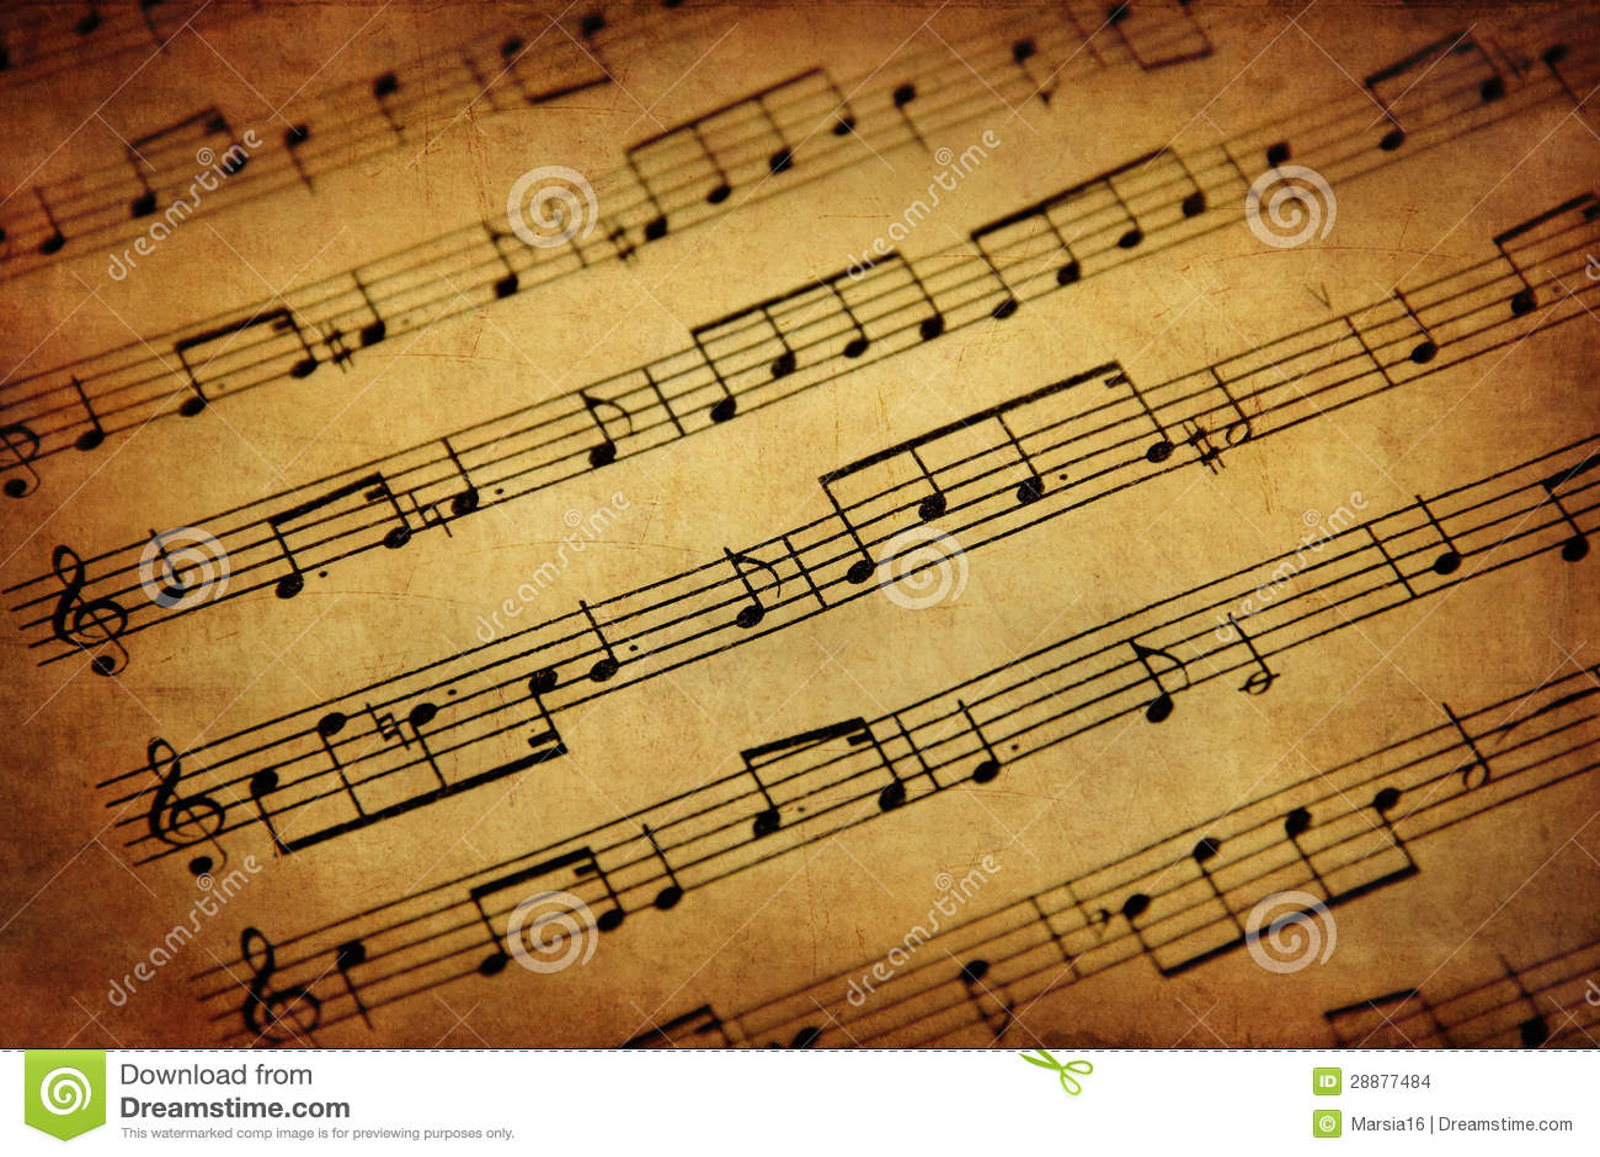 bass clef staff paper